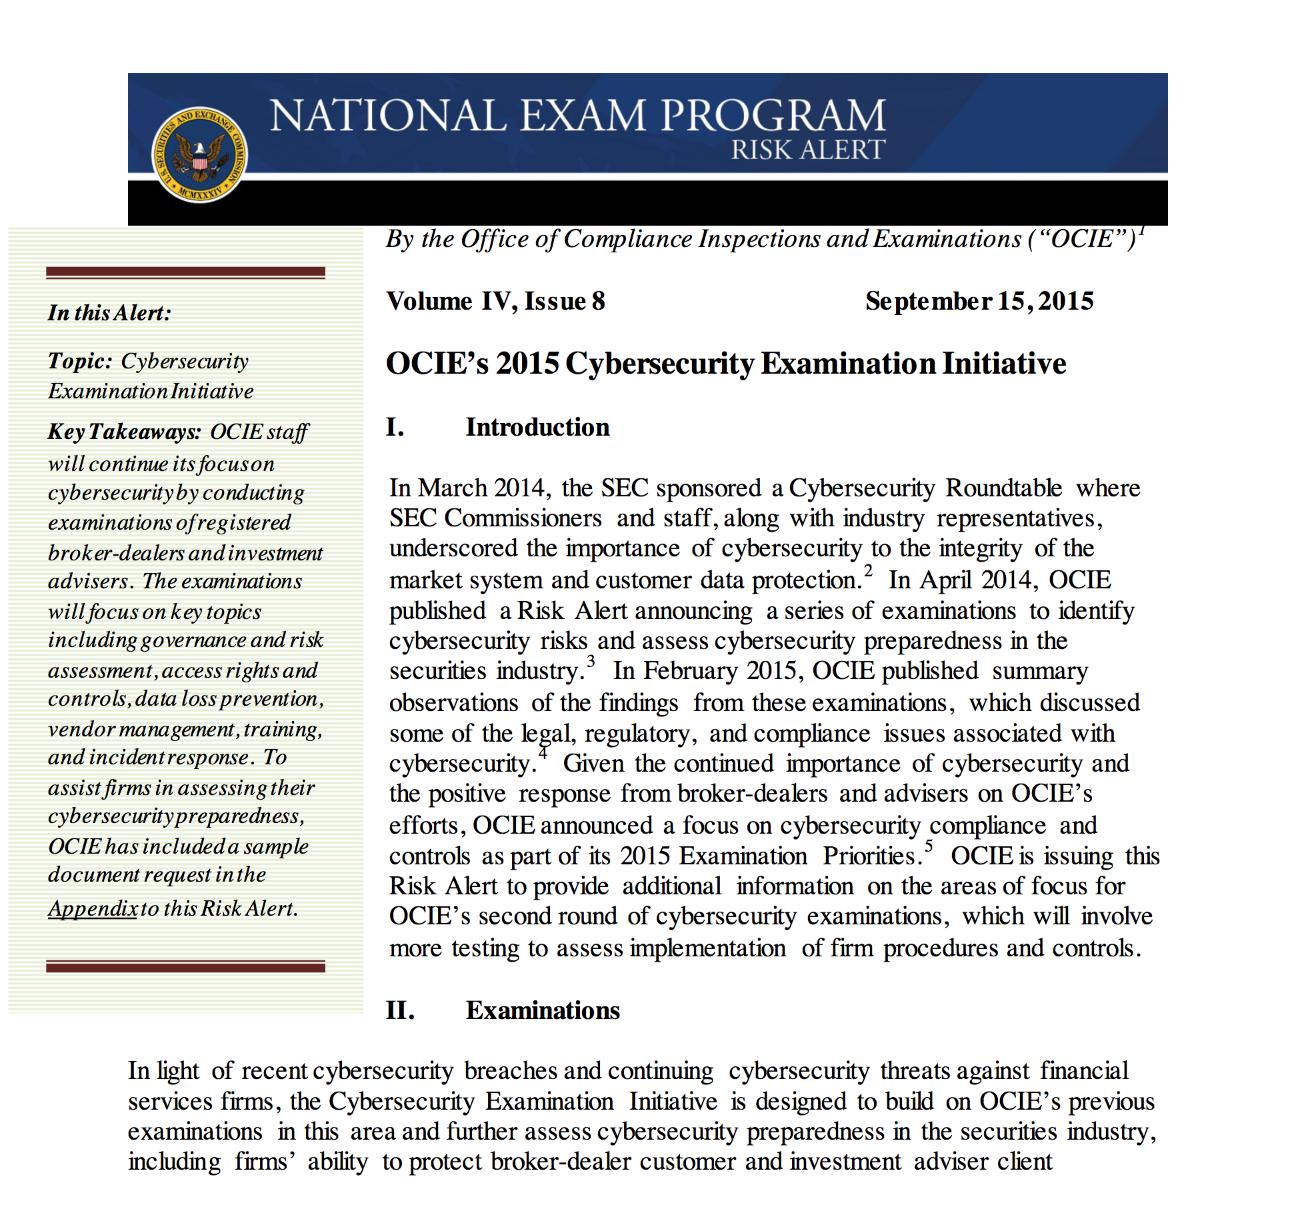 Cybersecurity Examination Initiative